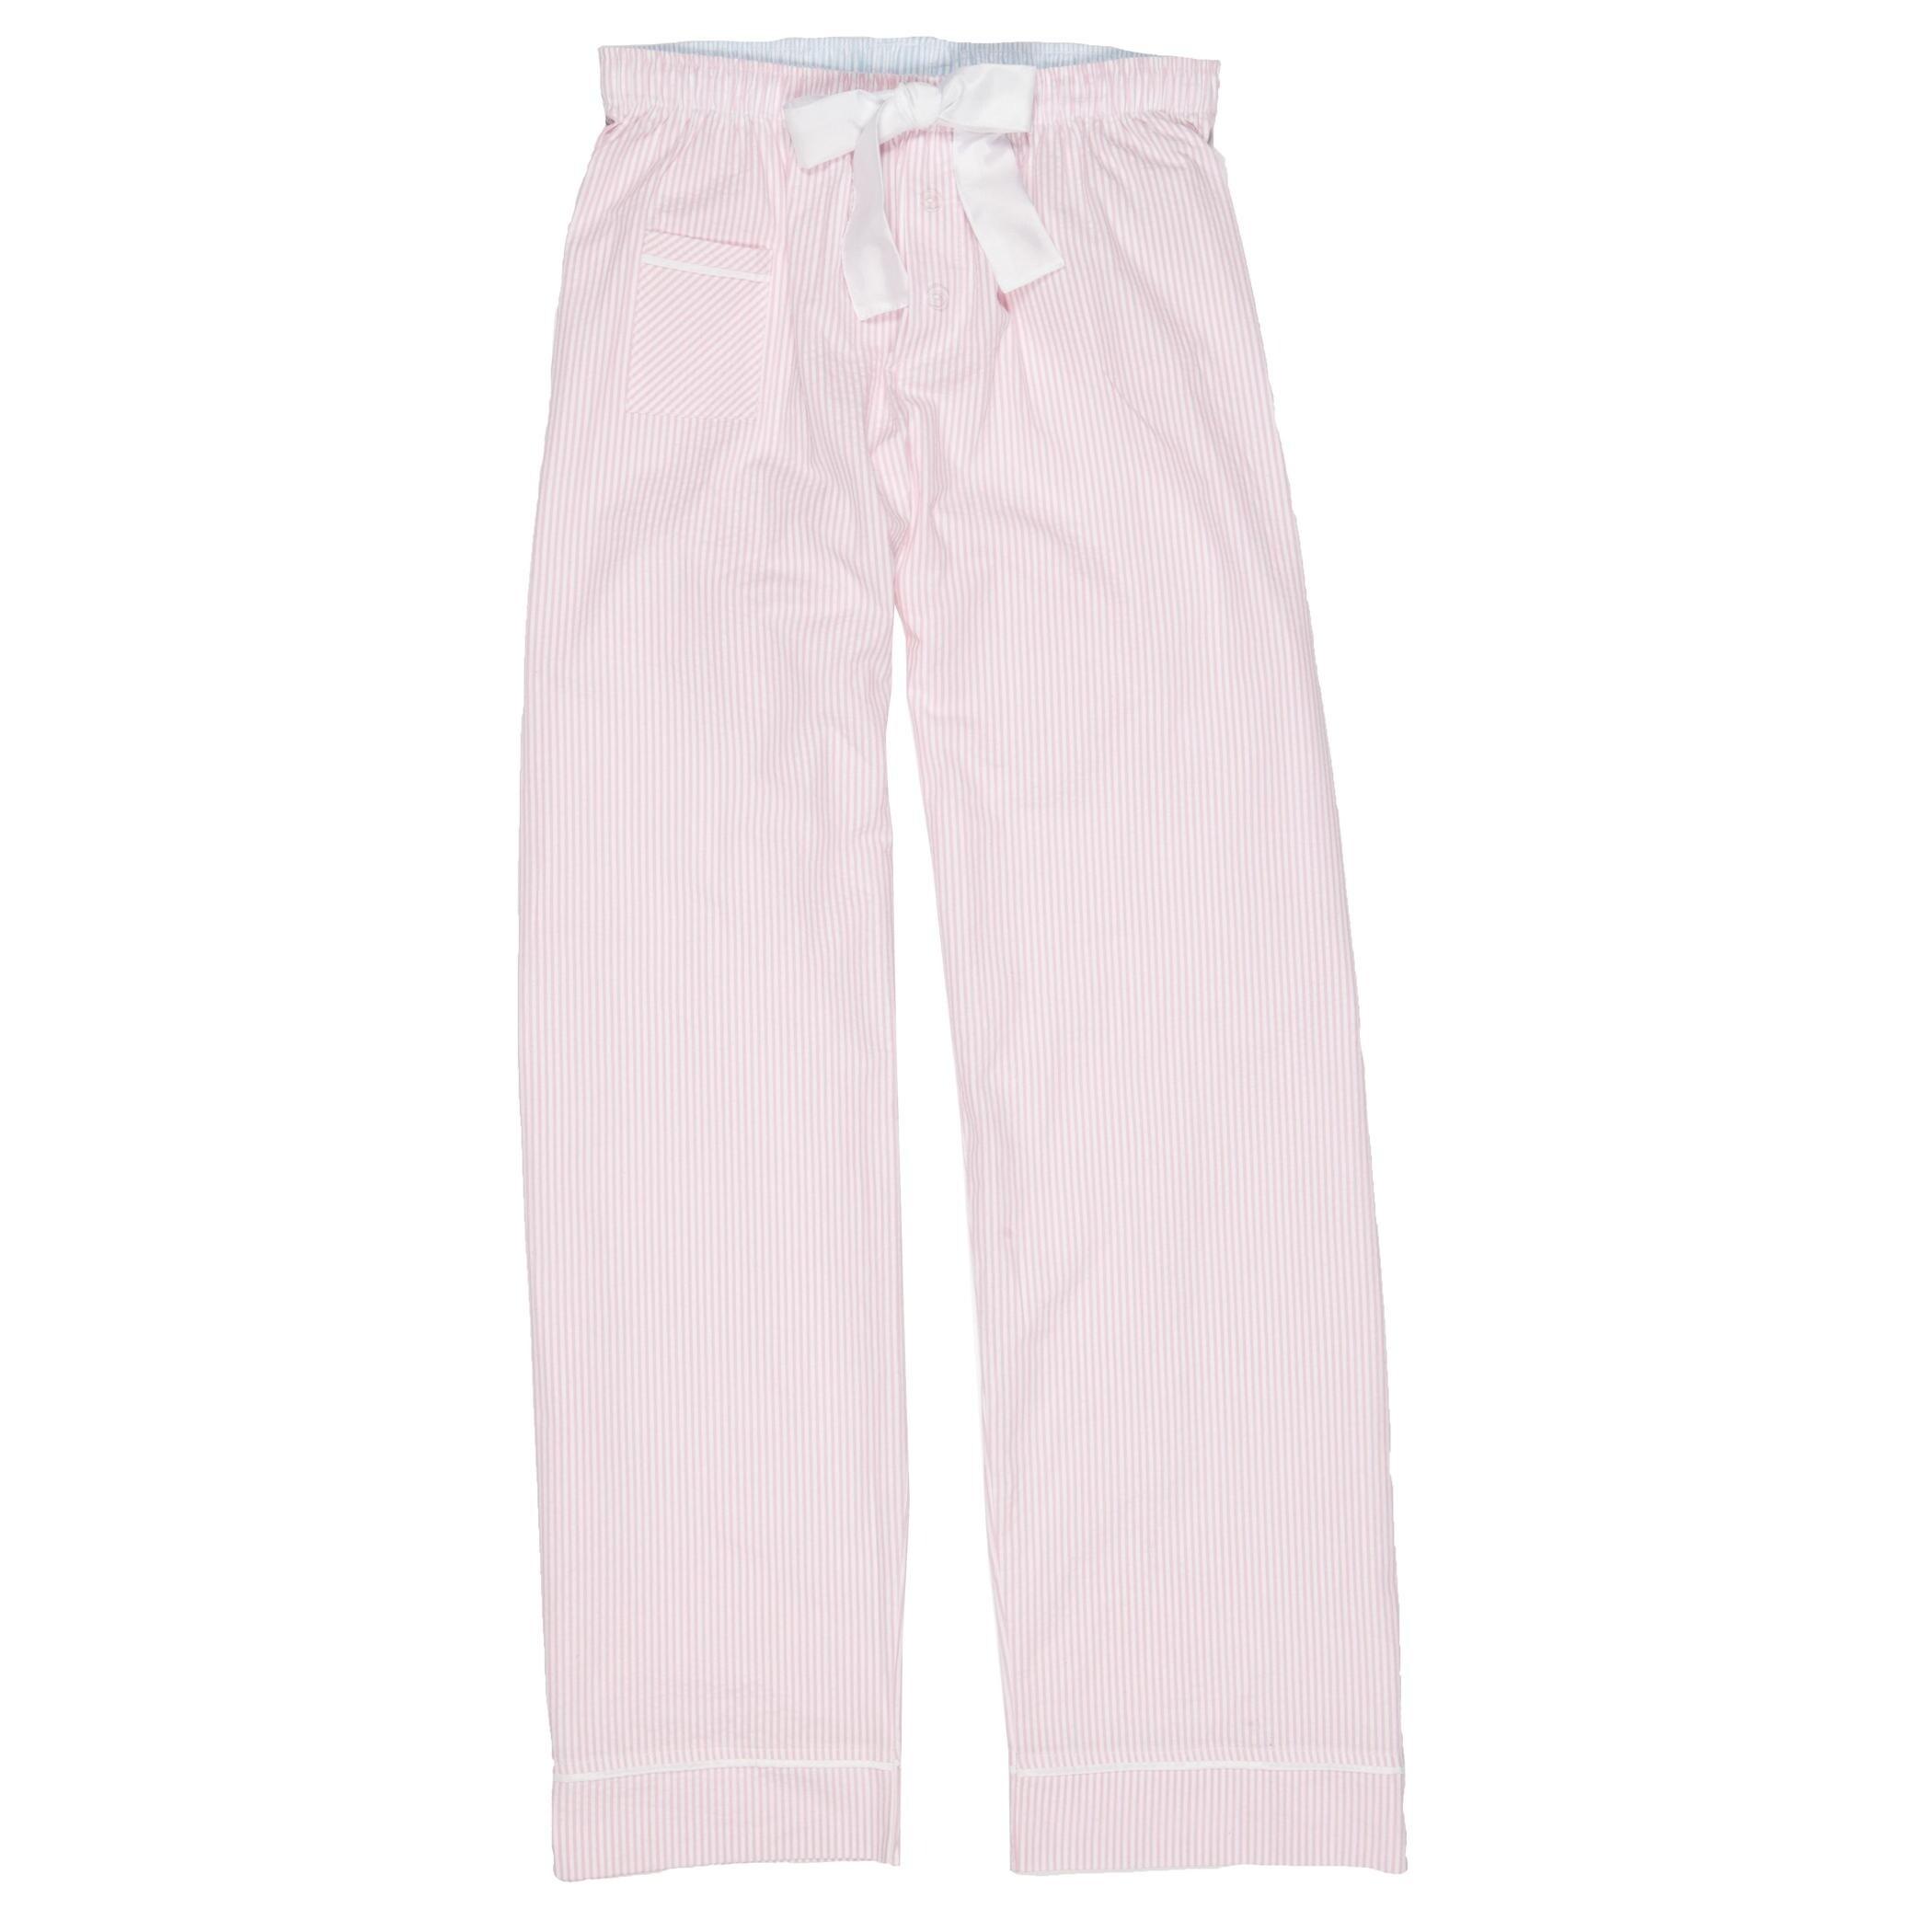 Boxercraft Women S Cotton Seersucker Pajama Pants On Sale Overstock 14277891